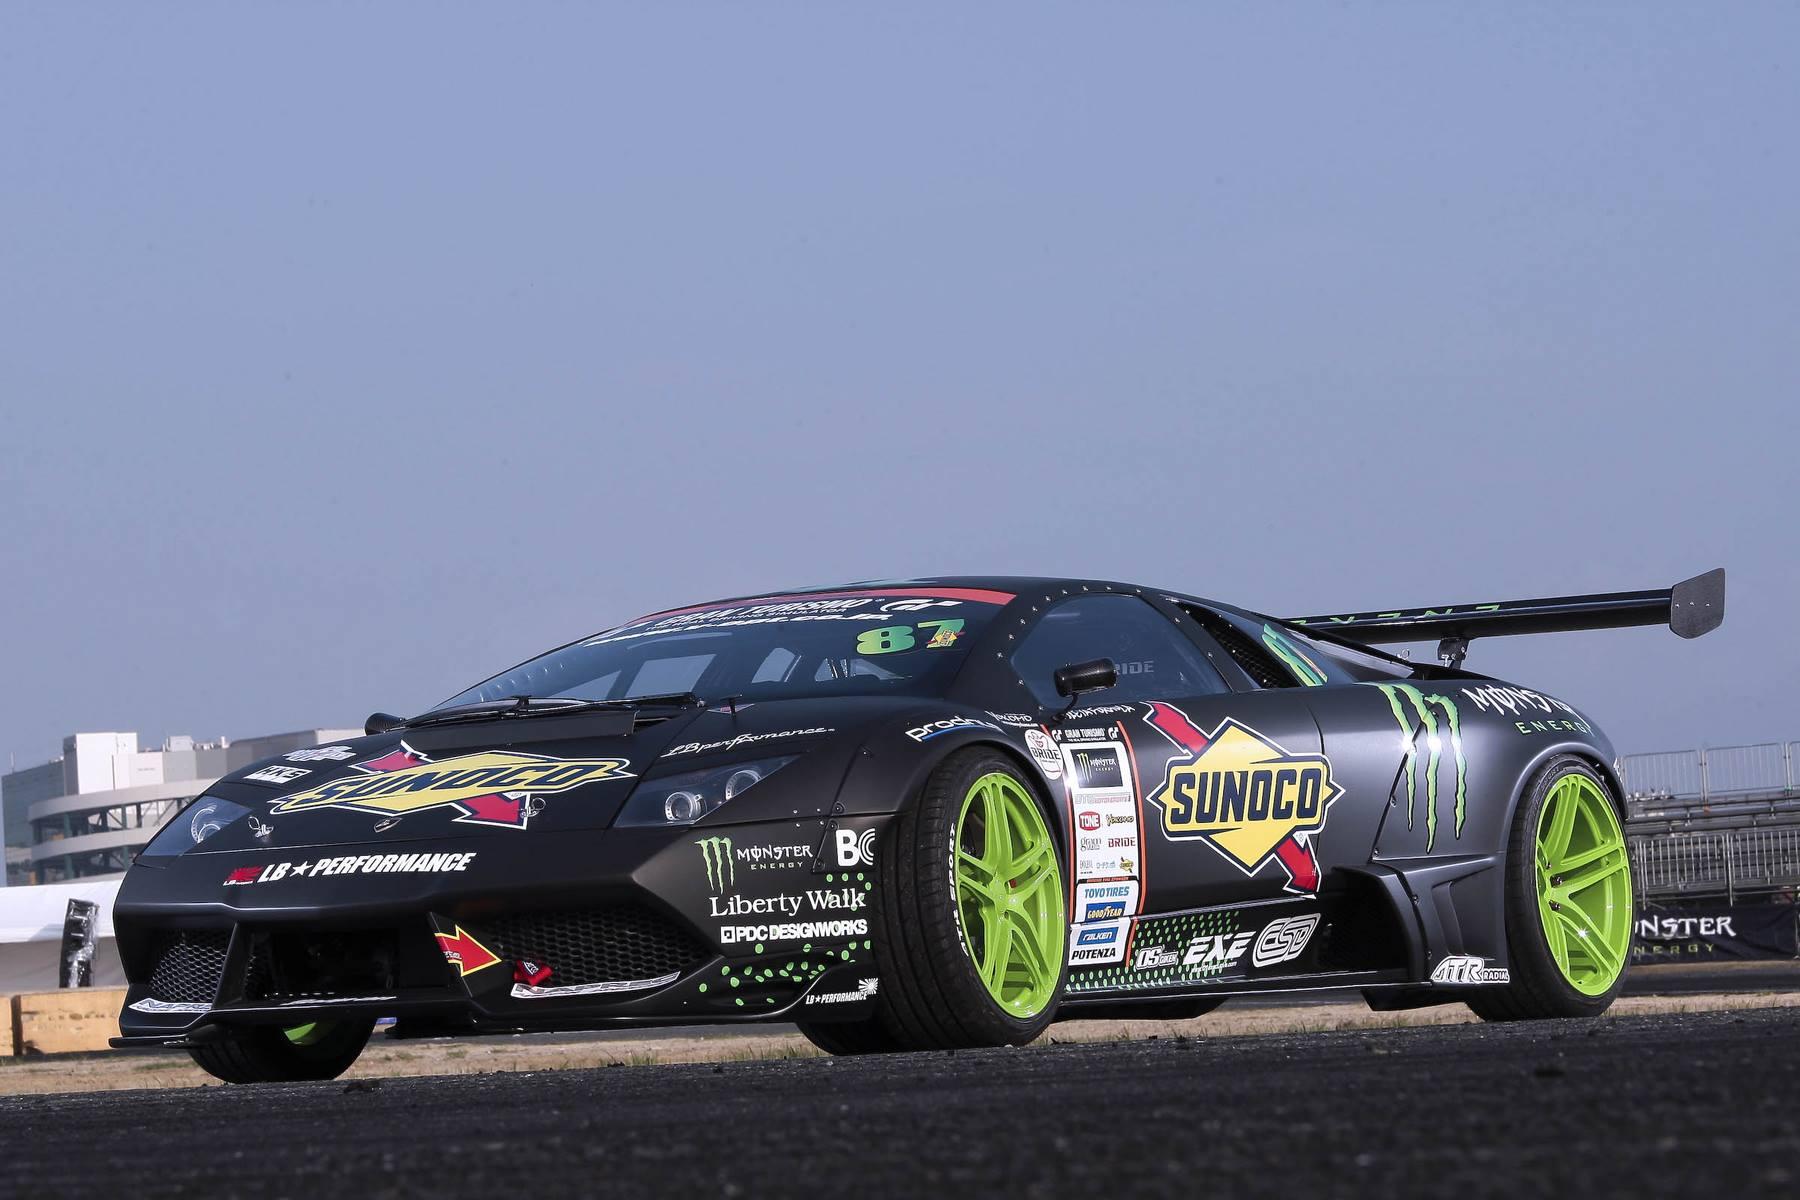 Meet The World S First Lamborghini Drift Car Gtspirit